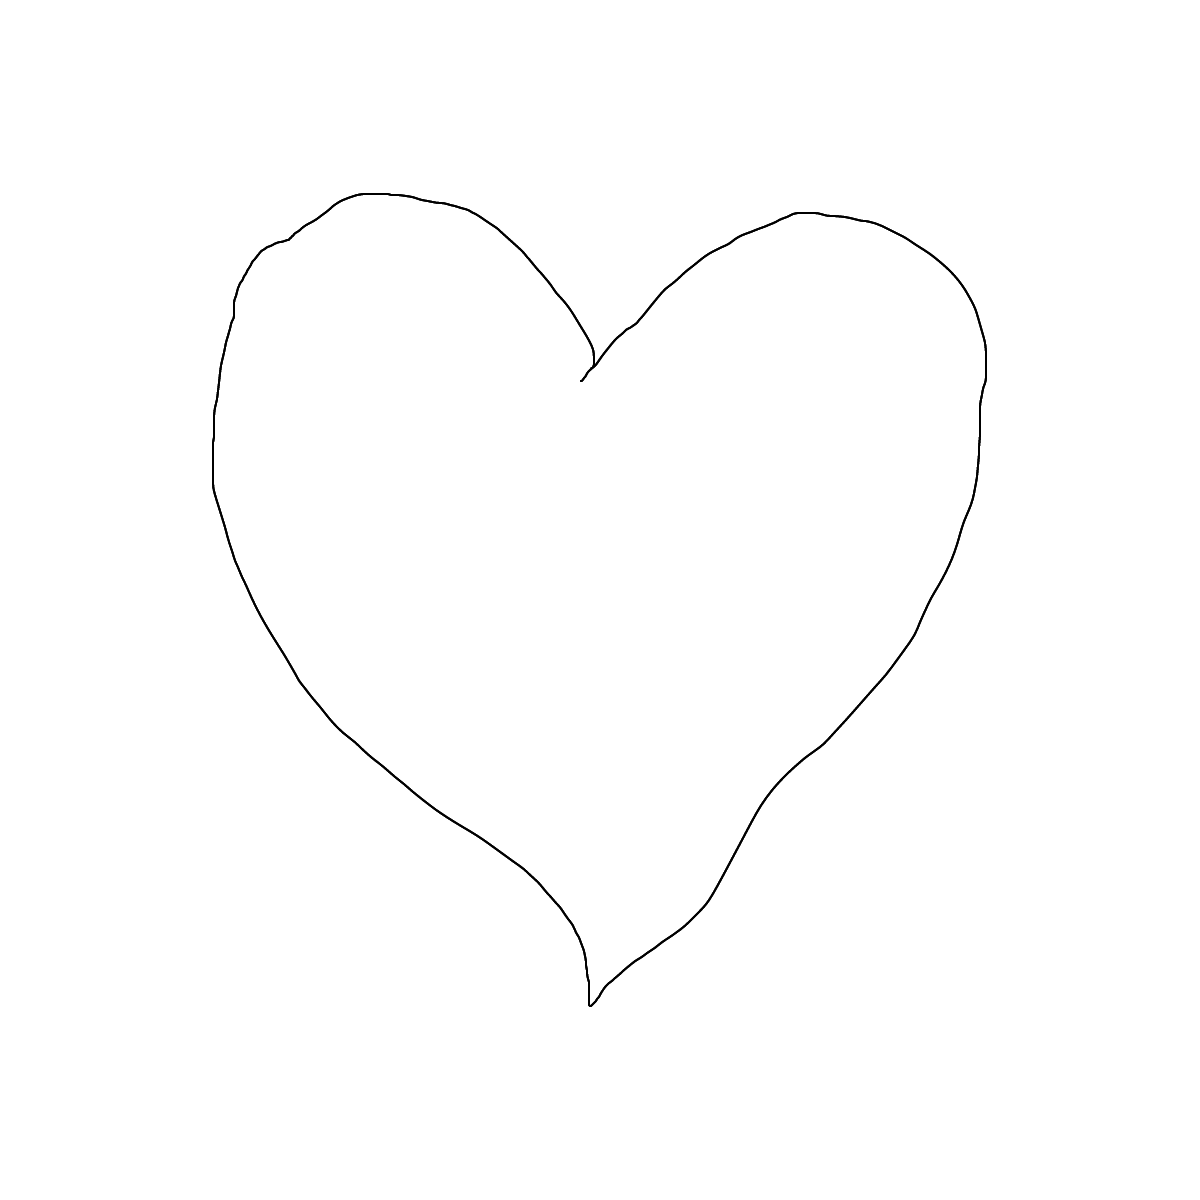 BAAAM drawing#247 lat:29.9240264892578120lng: -95.6126632690429700